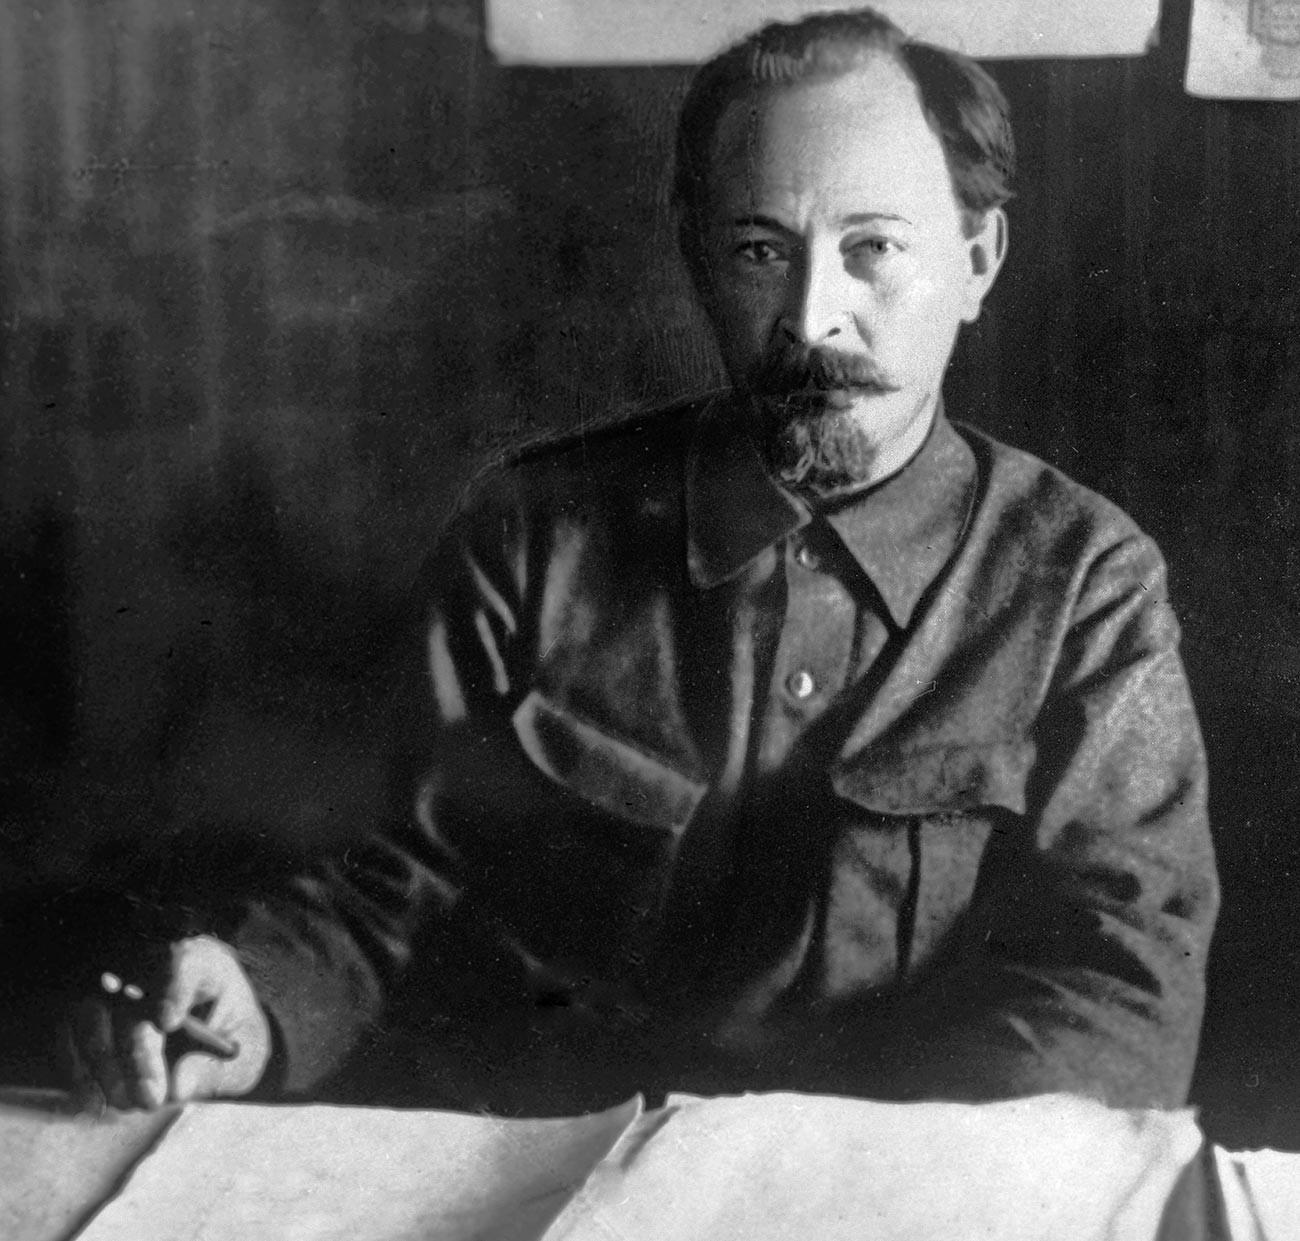 Féliks Dzerjinski